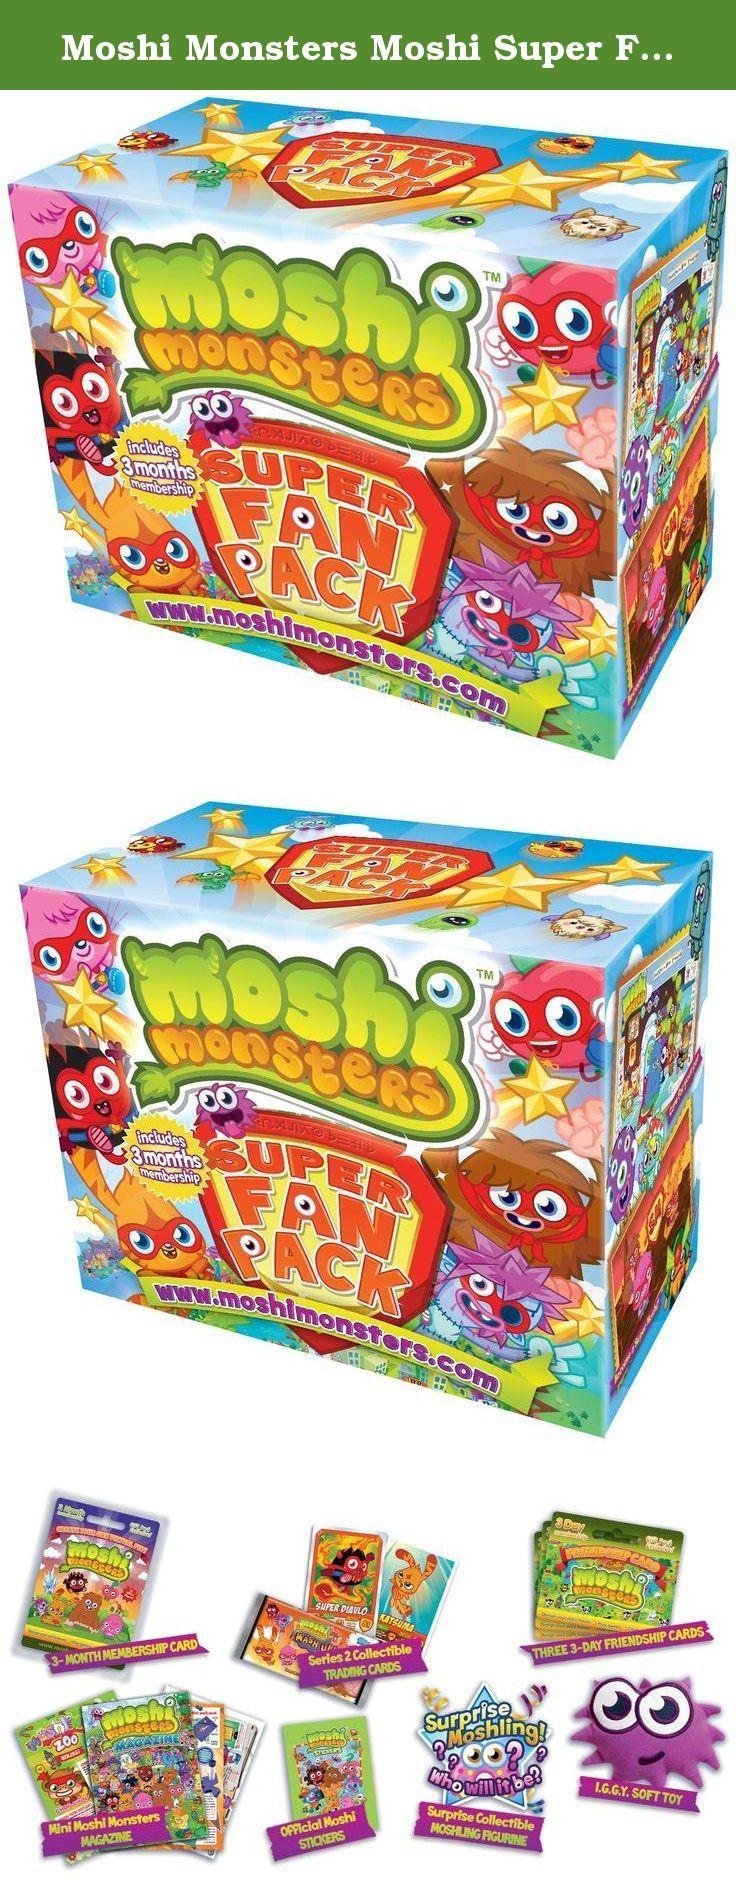 Moshi Monsters Moshi Super Fan Pack. The Moshi Monsters